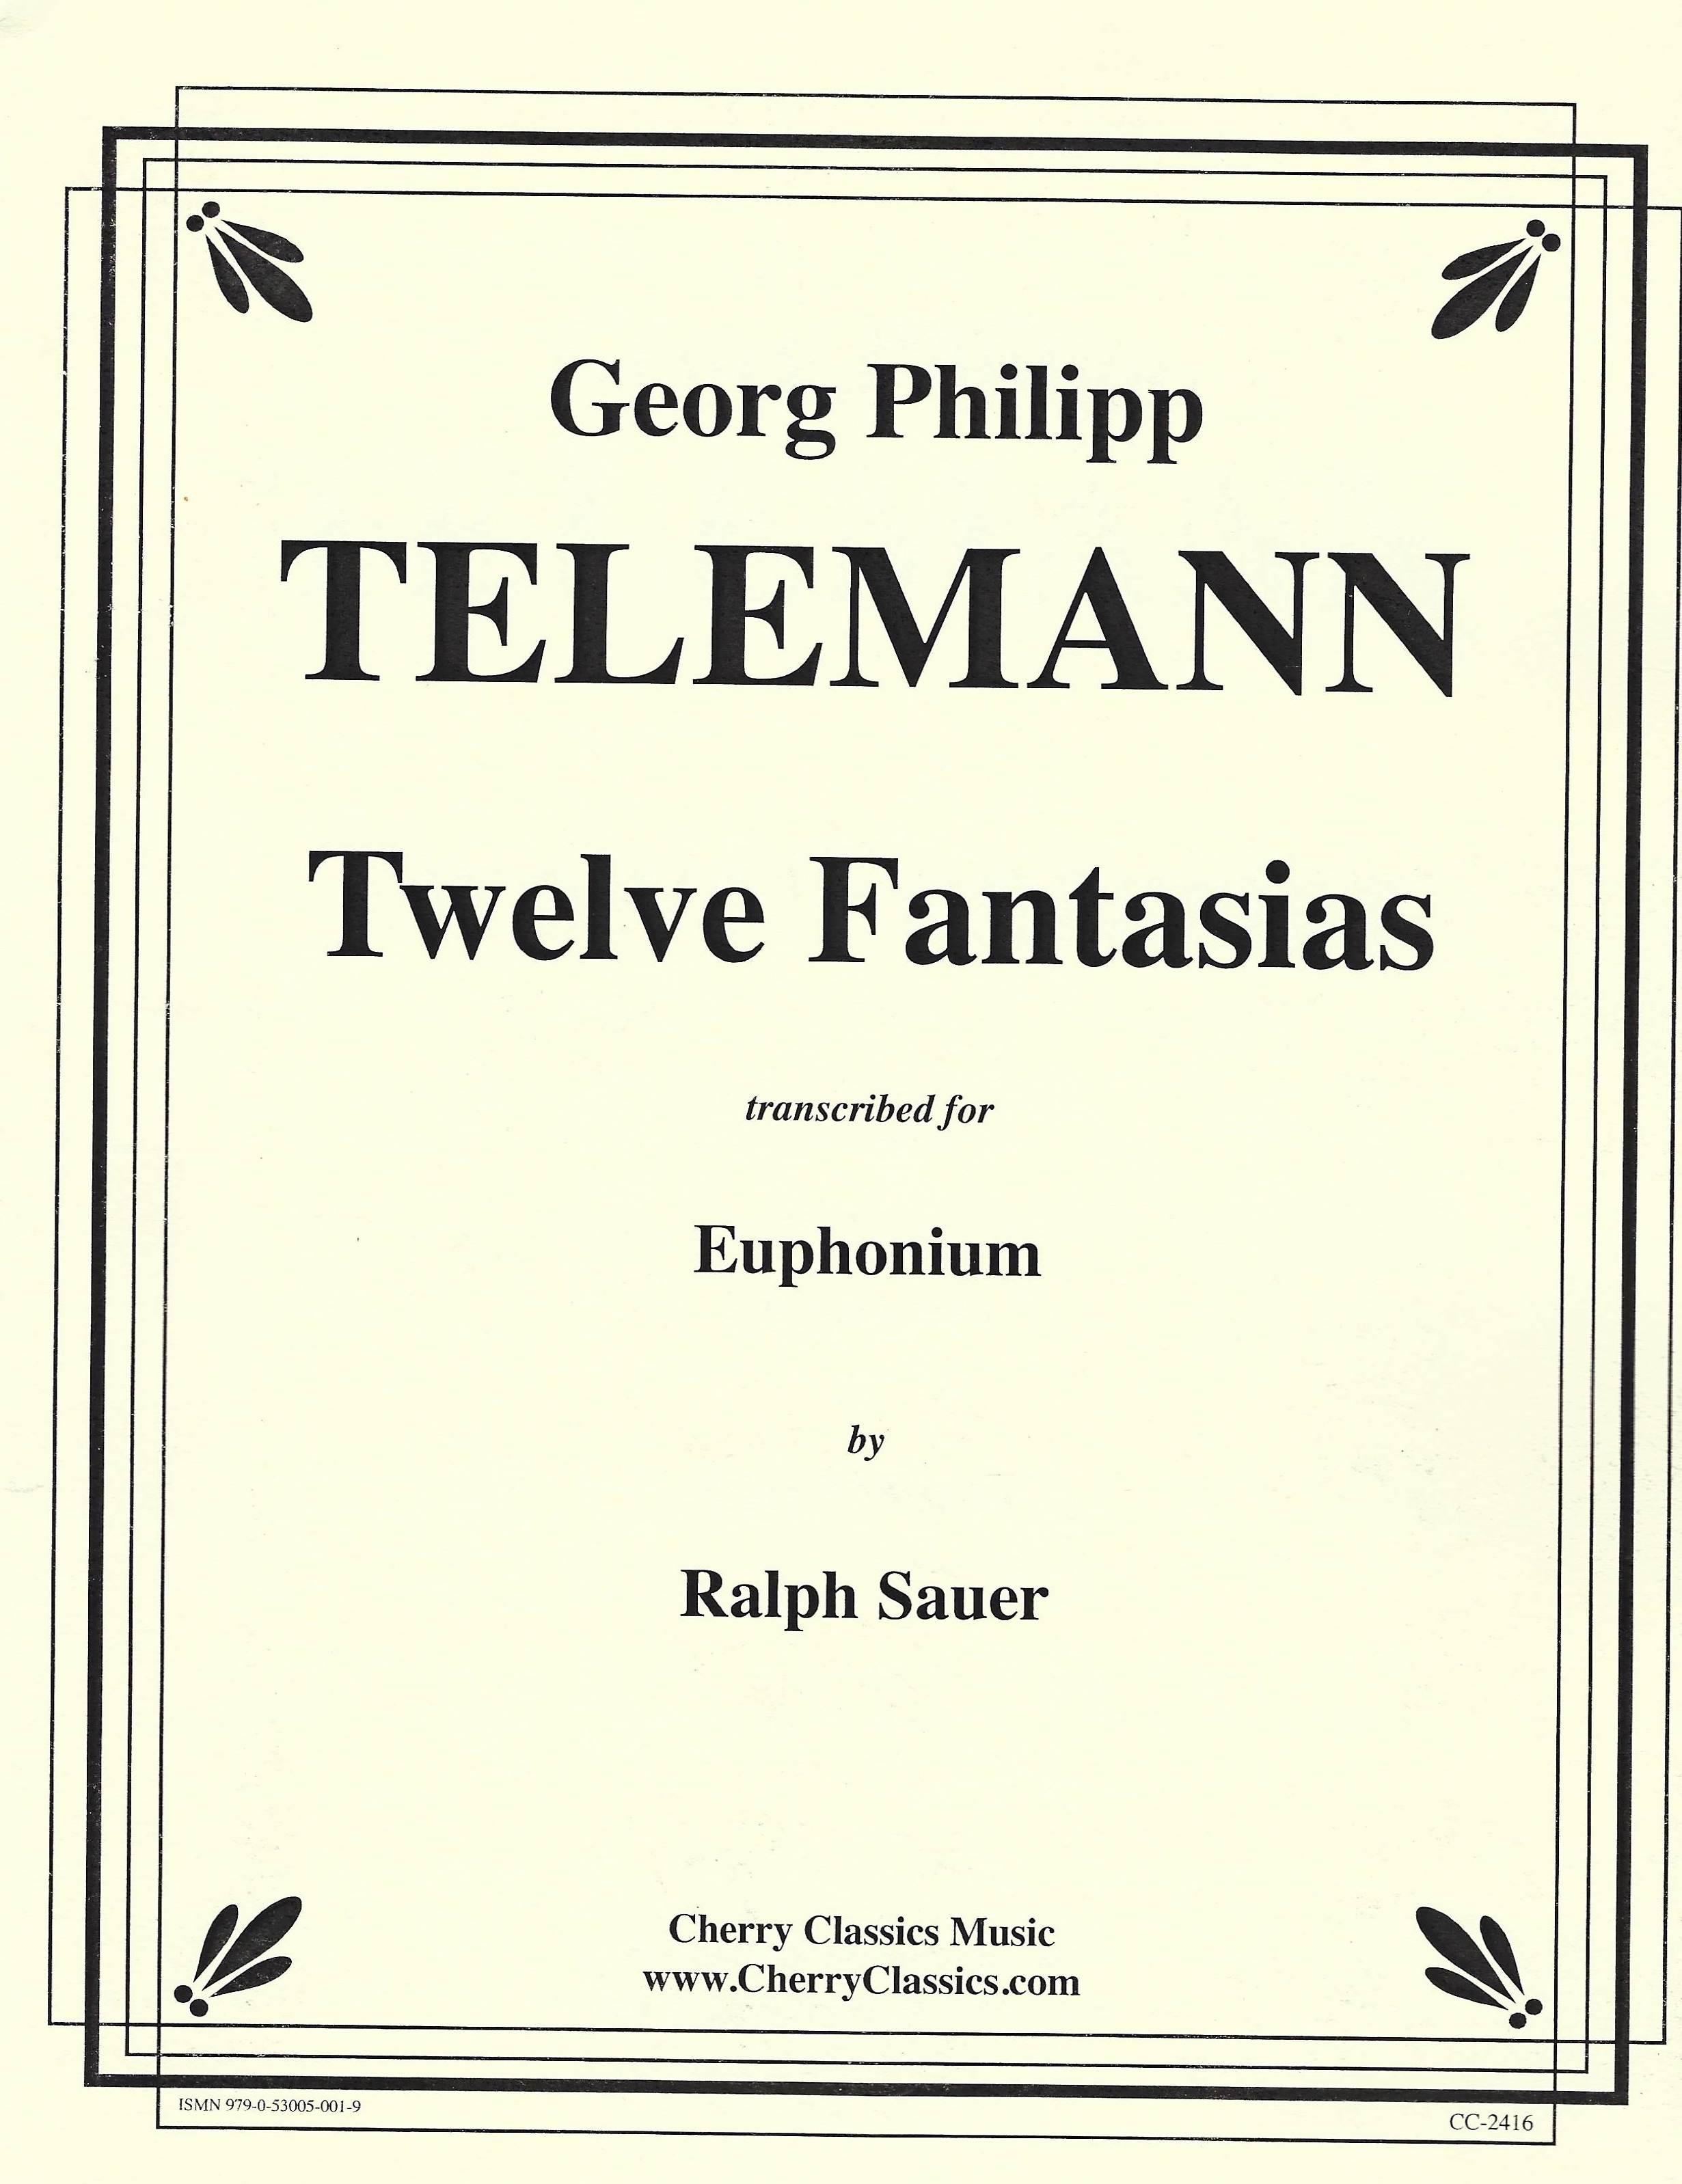 Twelve Fantasies - G.P.Telemann Arr. Ralph Sauer - transcribed for solo euphonium (BC)